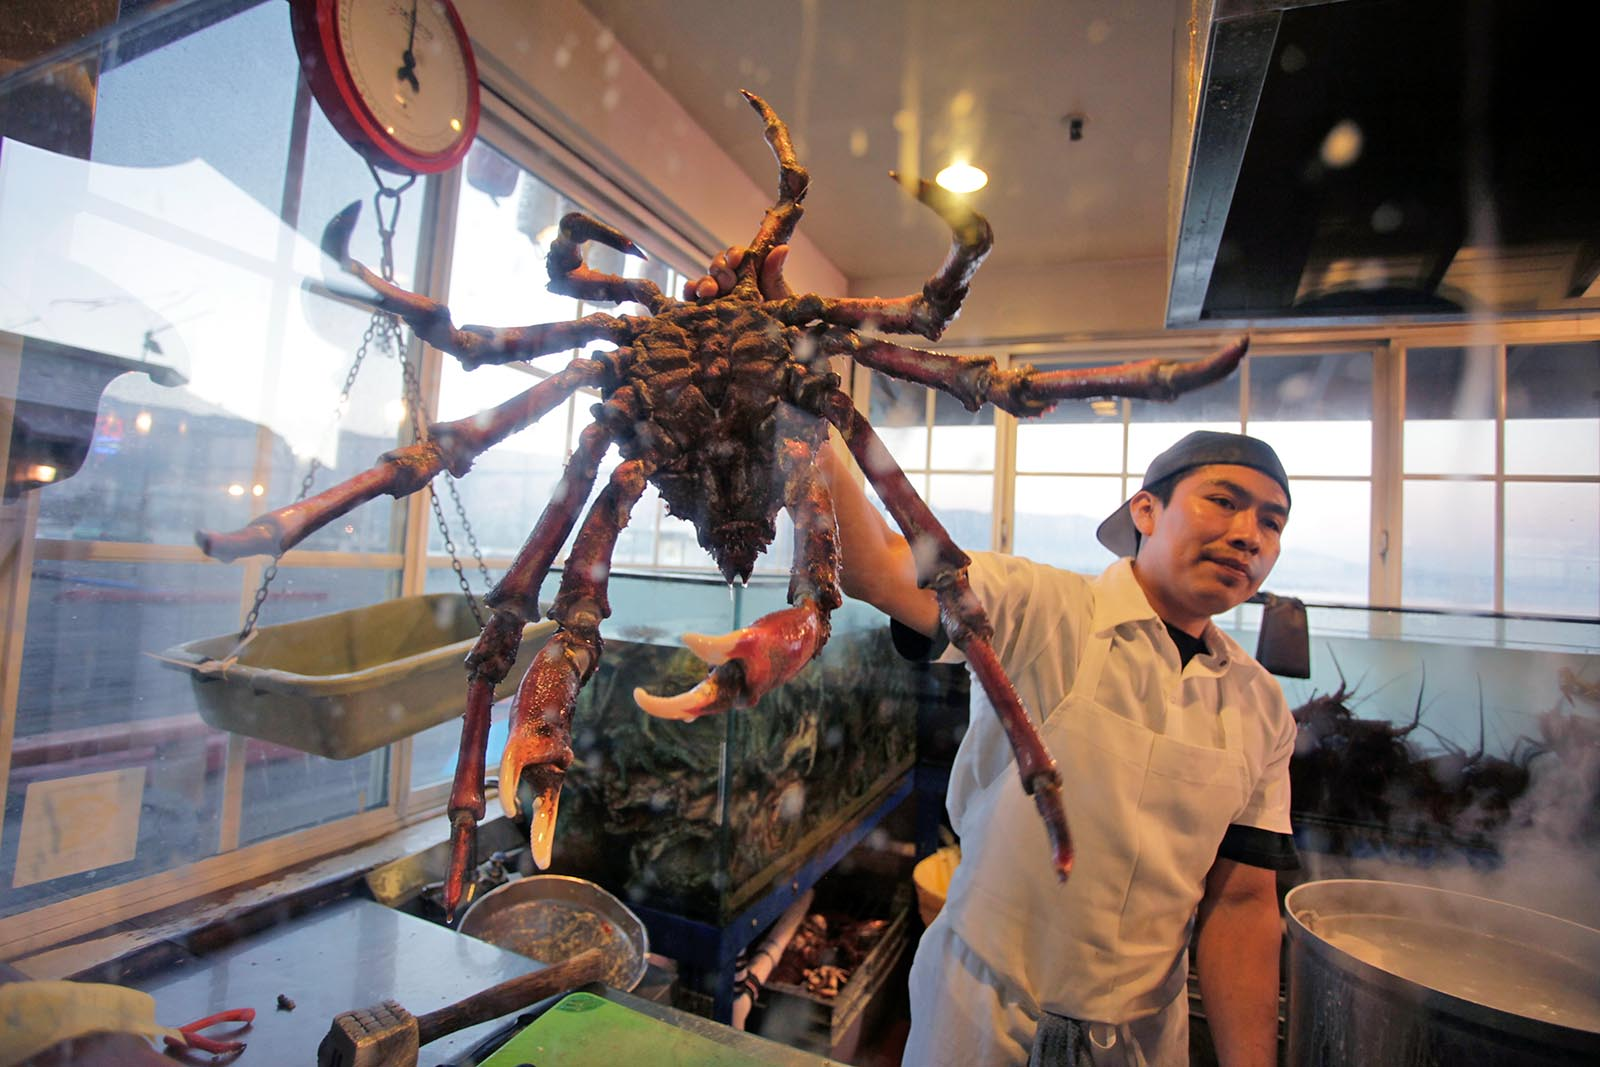 Mann haelt Hummer Krabbe in der Hand in der Kueche